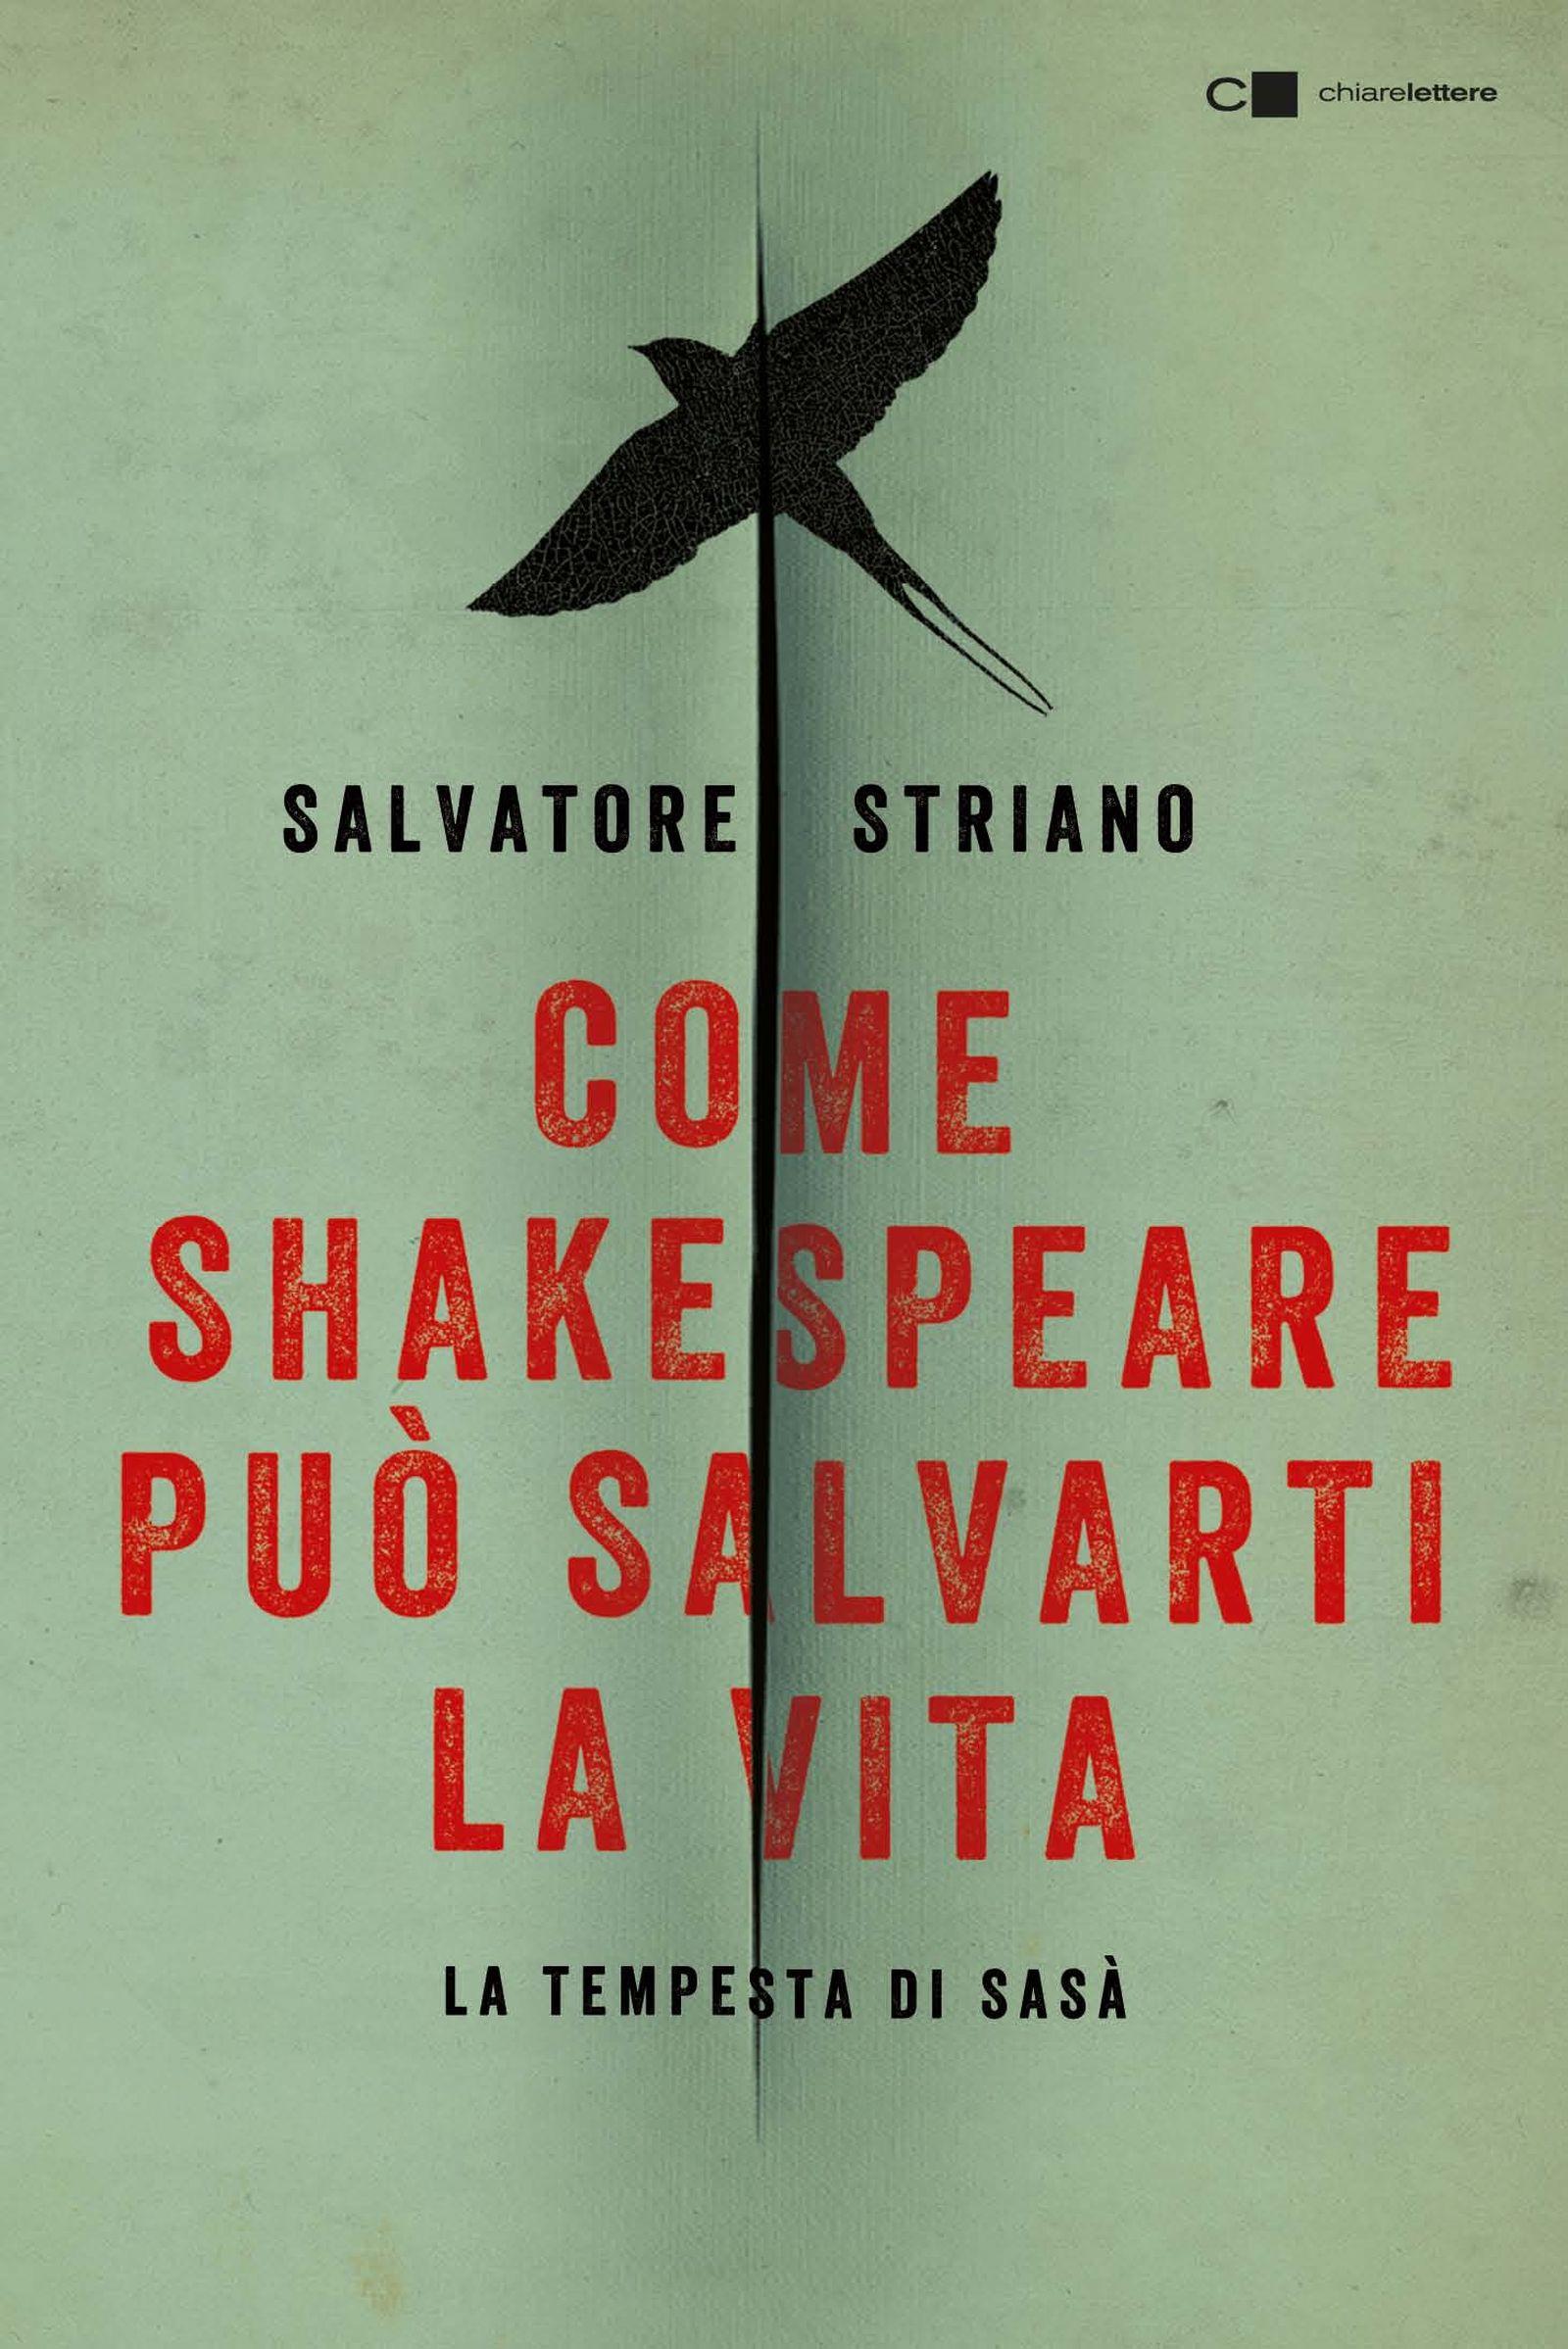 come shakespeare può slavarti la vita anteo impresa sociale